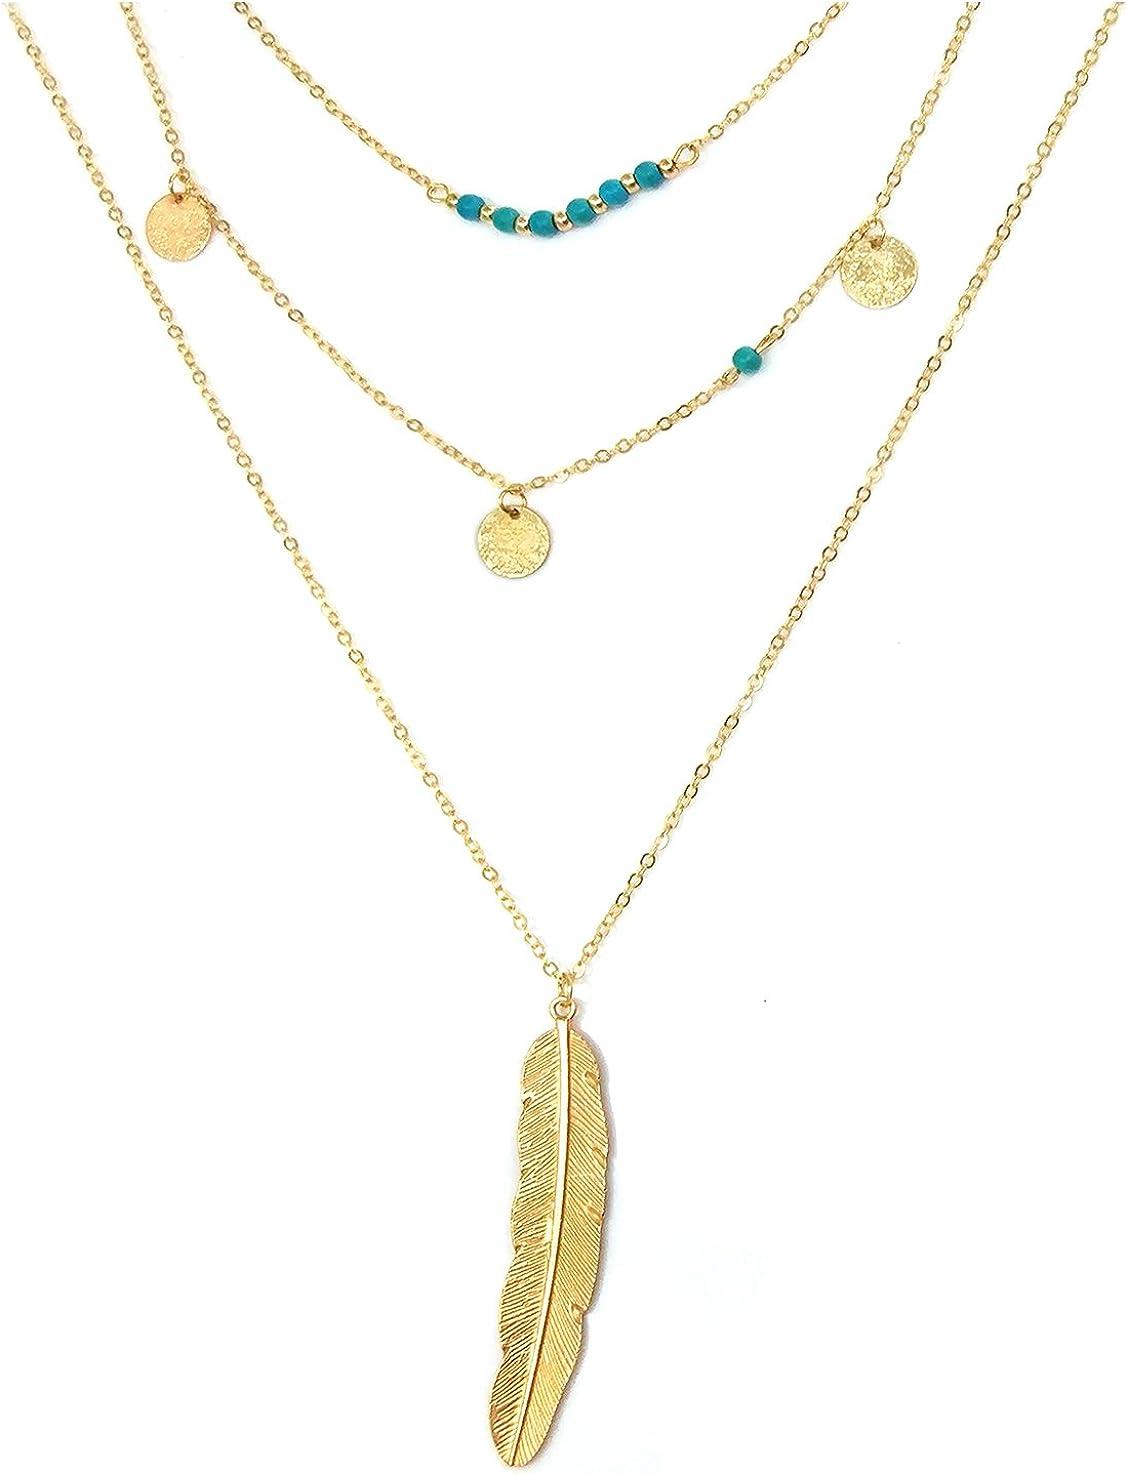 Suyi Exquisita Lentejuelas Multicapa Cadena de Turquesa Perlas Collar con Colgante de Plumas